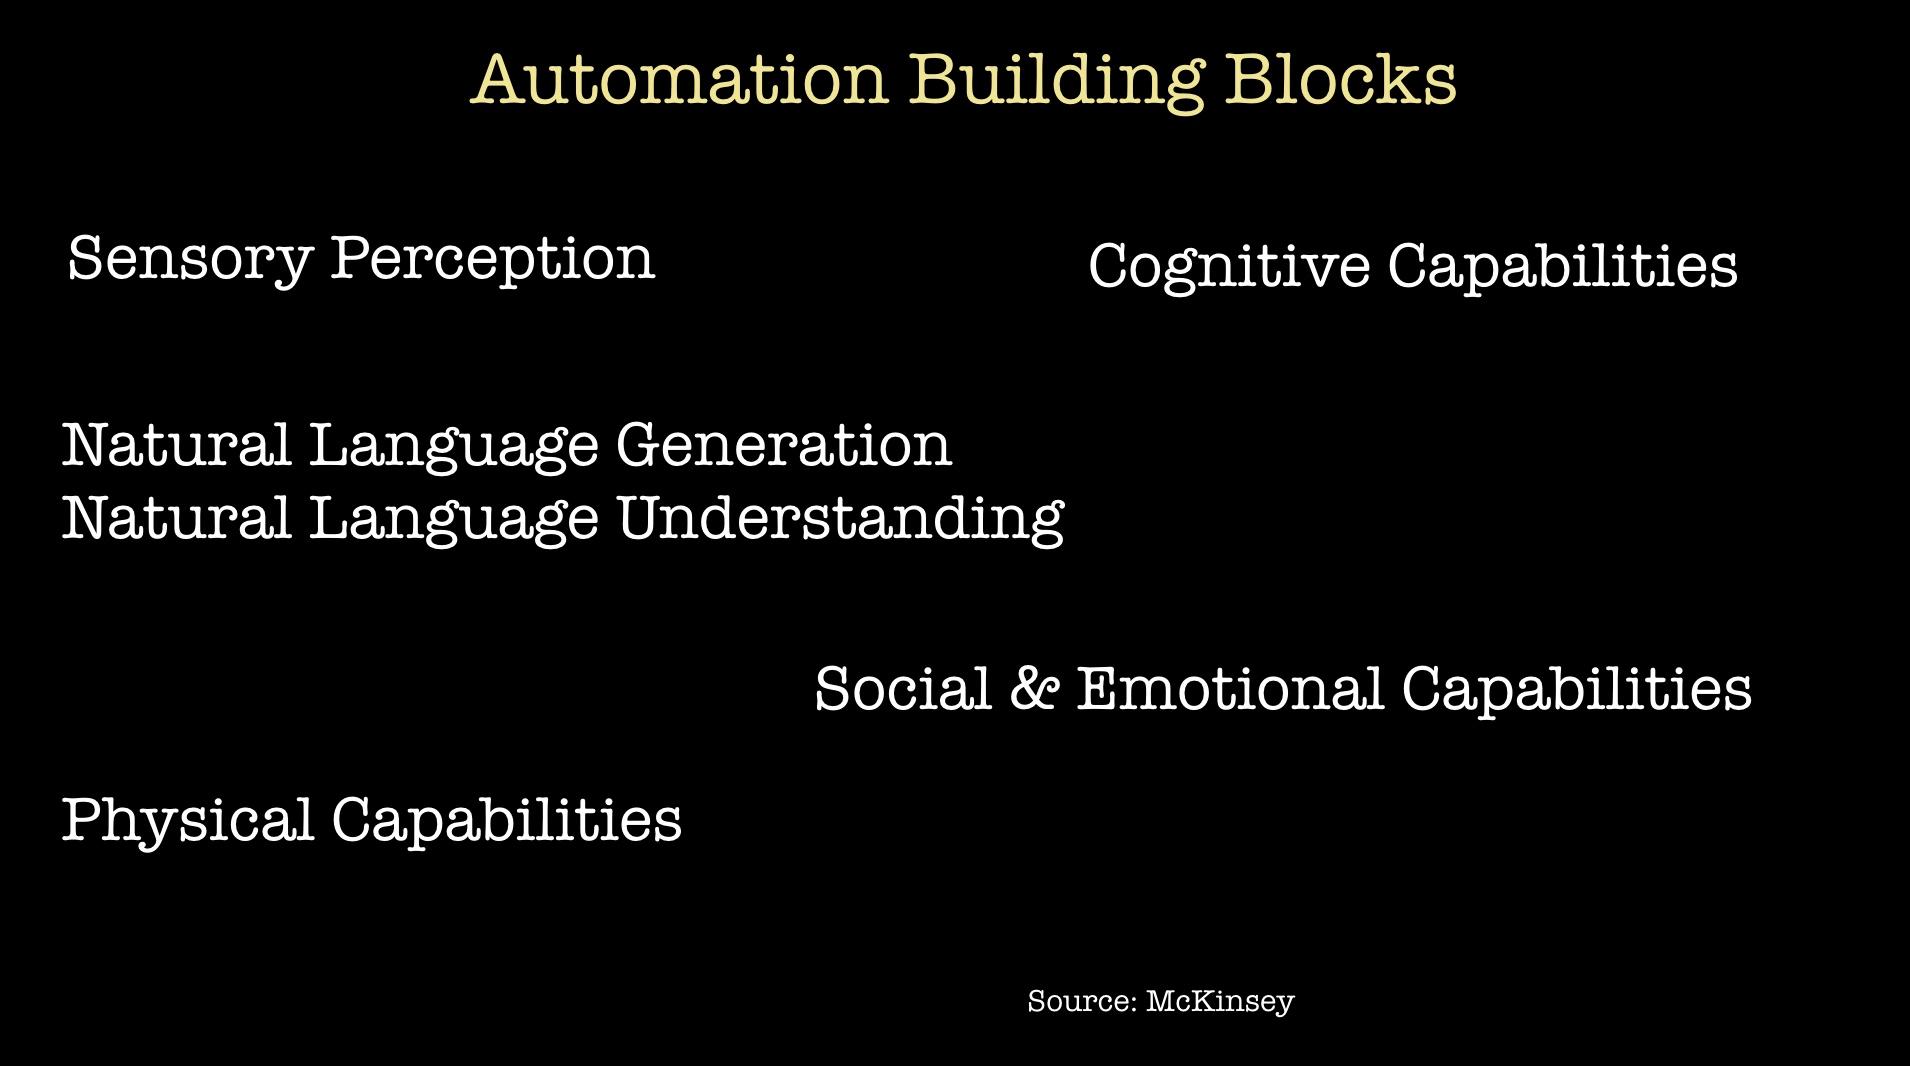 automation building blocks